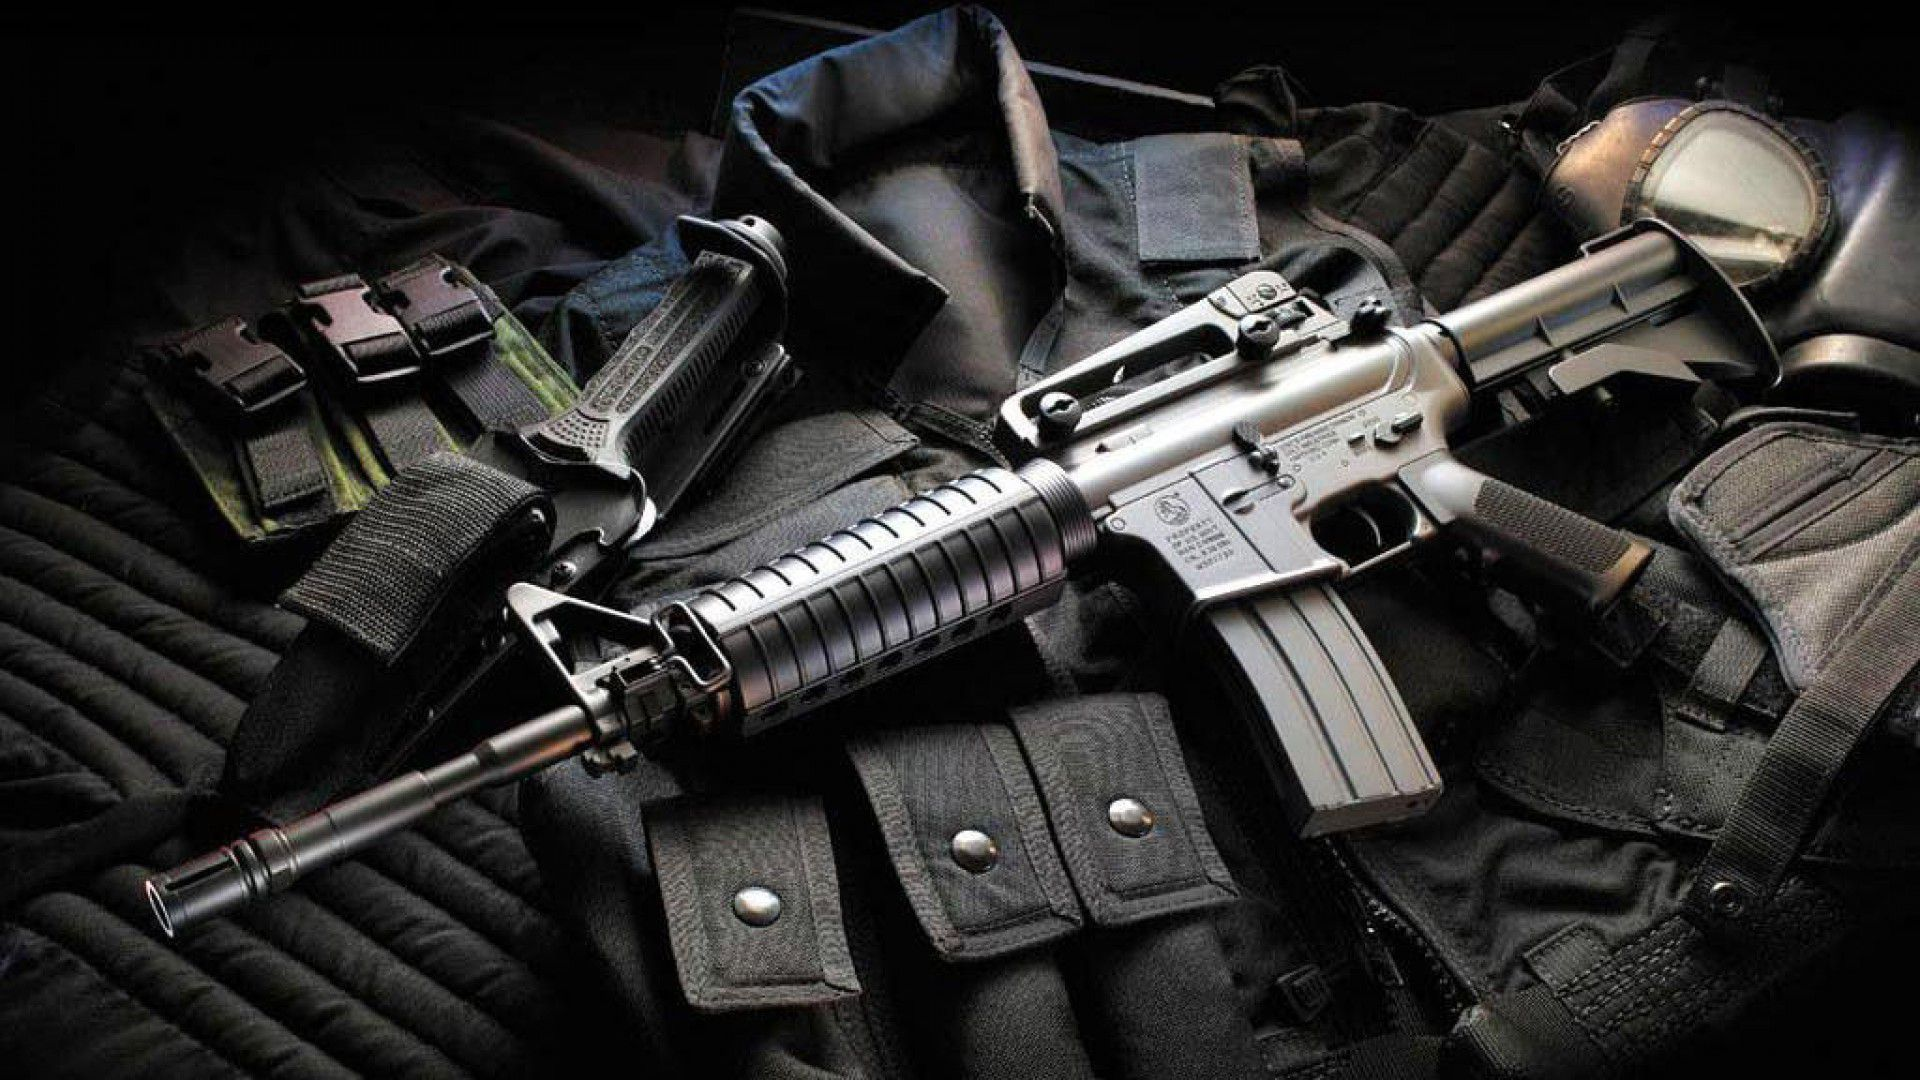 cool gun wallpaper tech guns weapons firearms